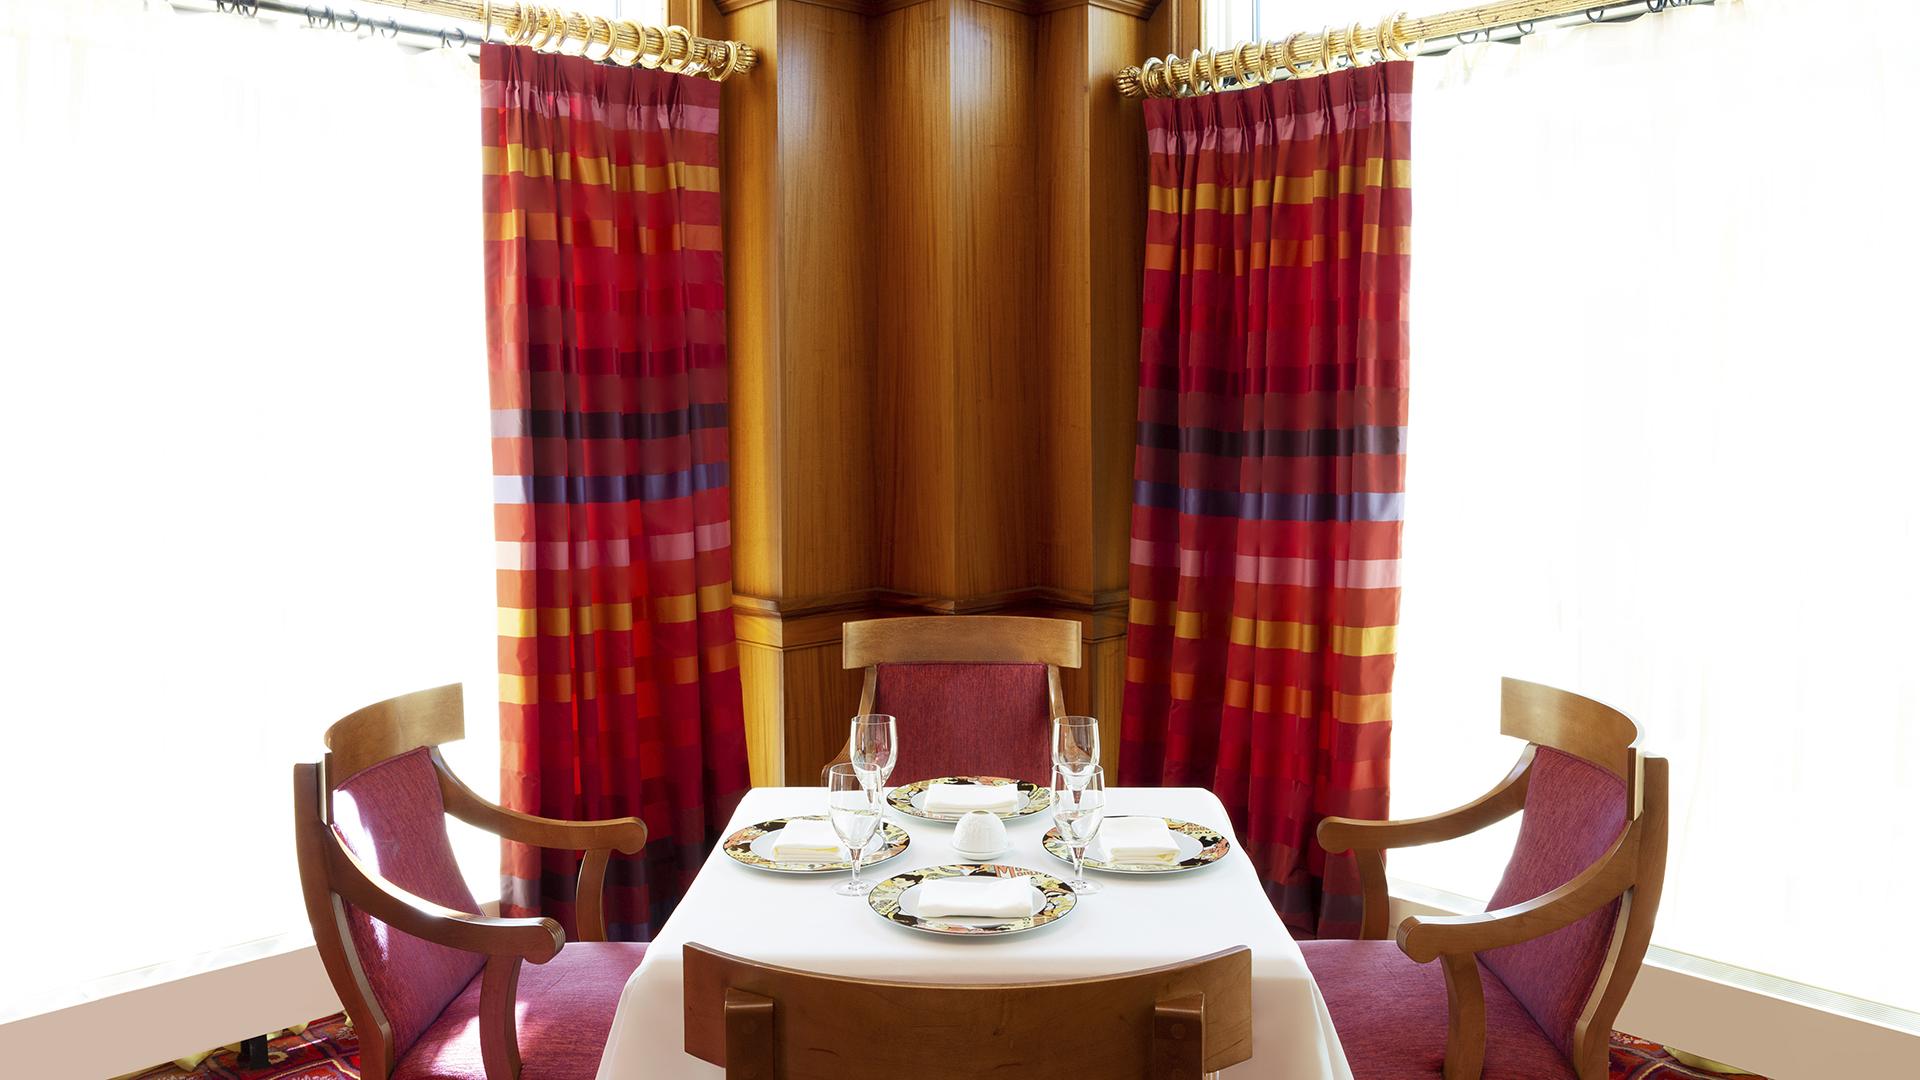 Lautrec table for four